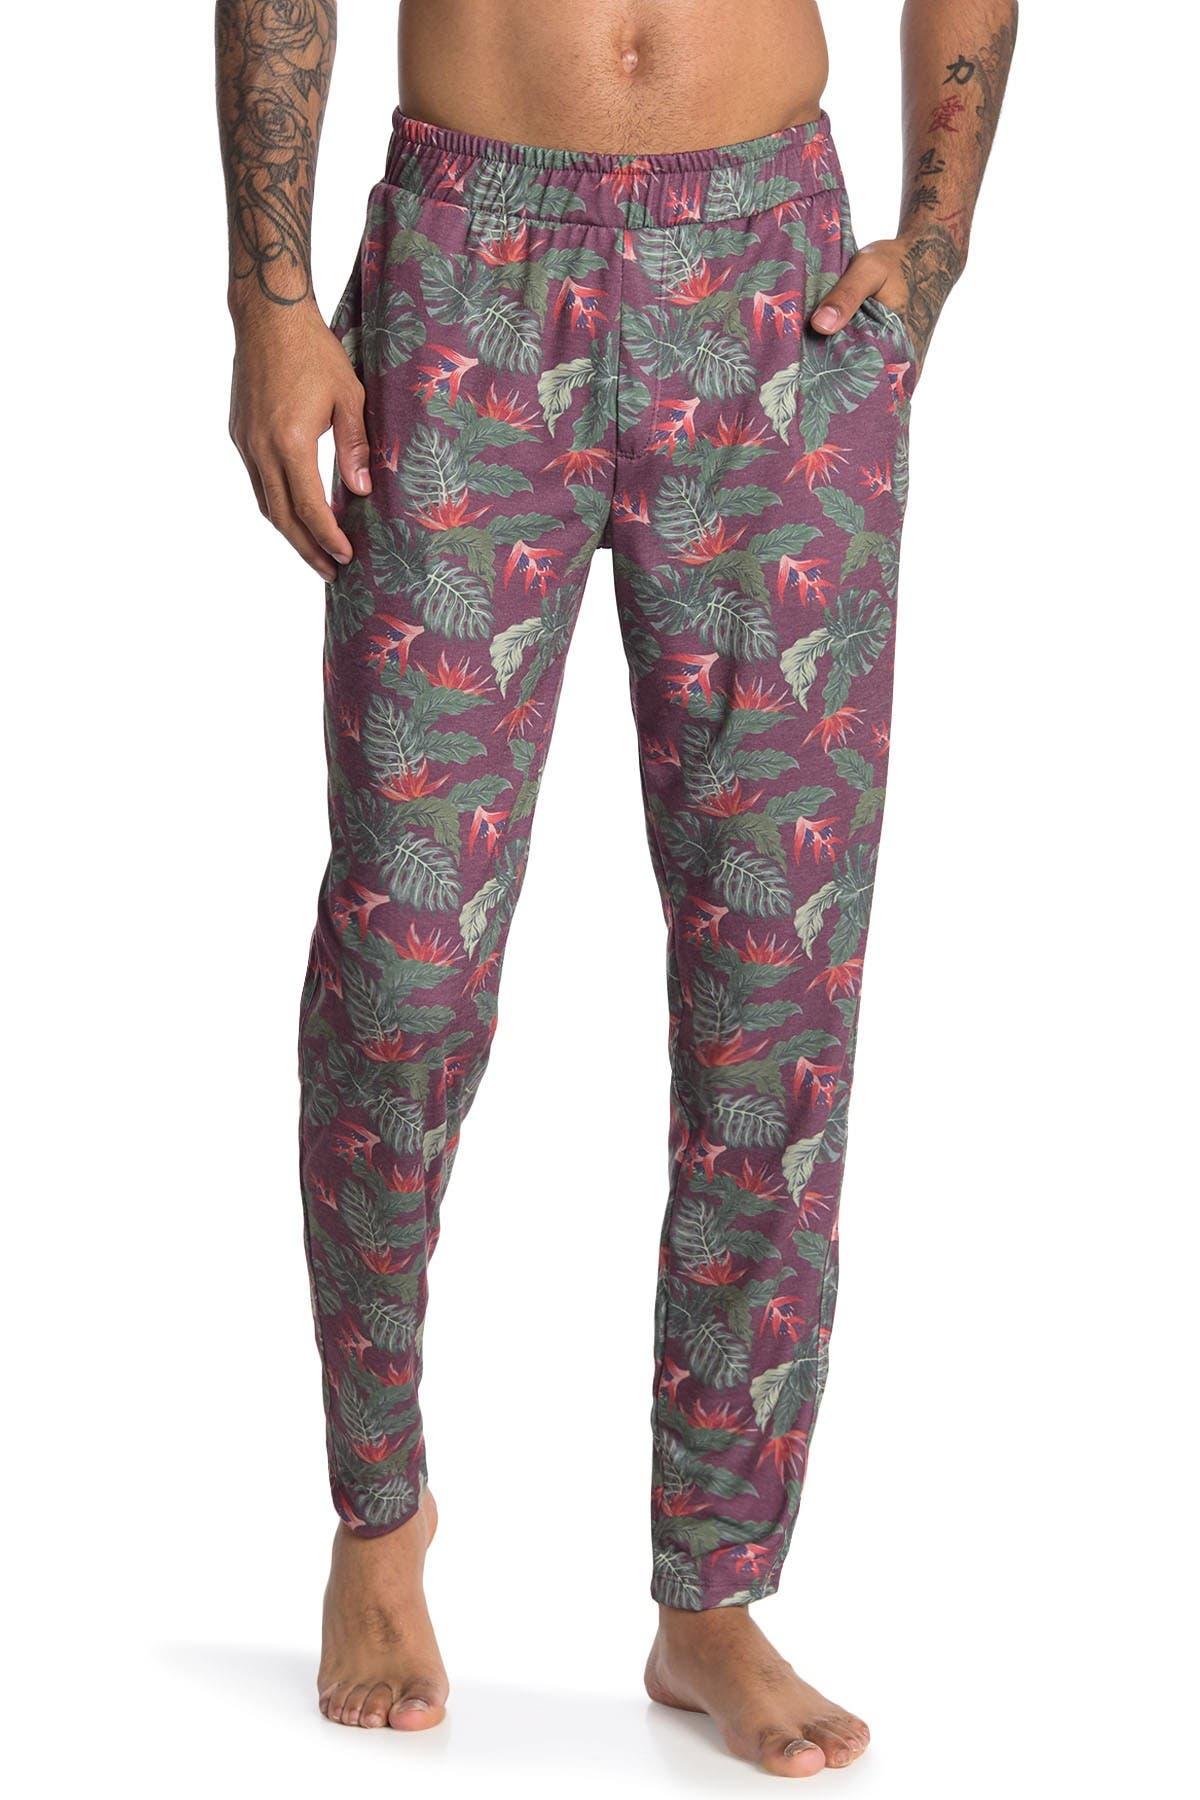 Image of COZY ROZY Baja Man Printed Lounge Pants